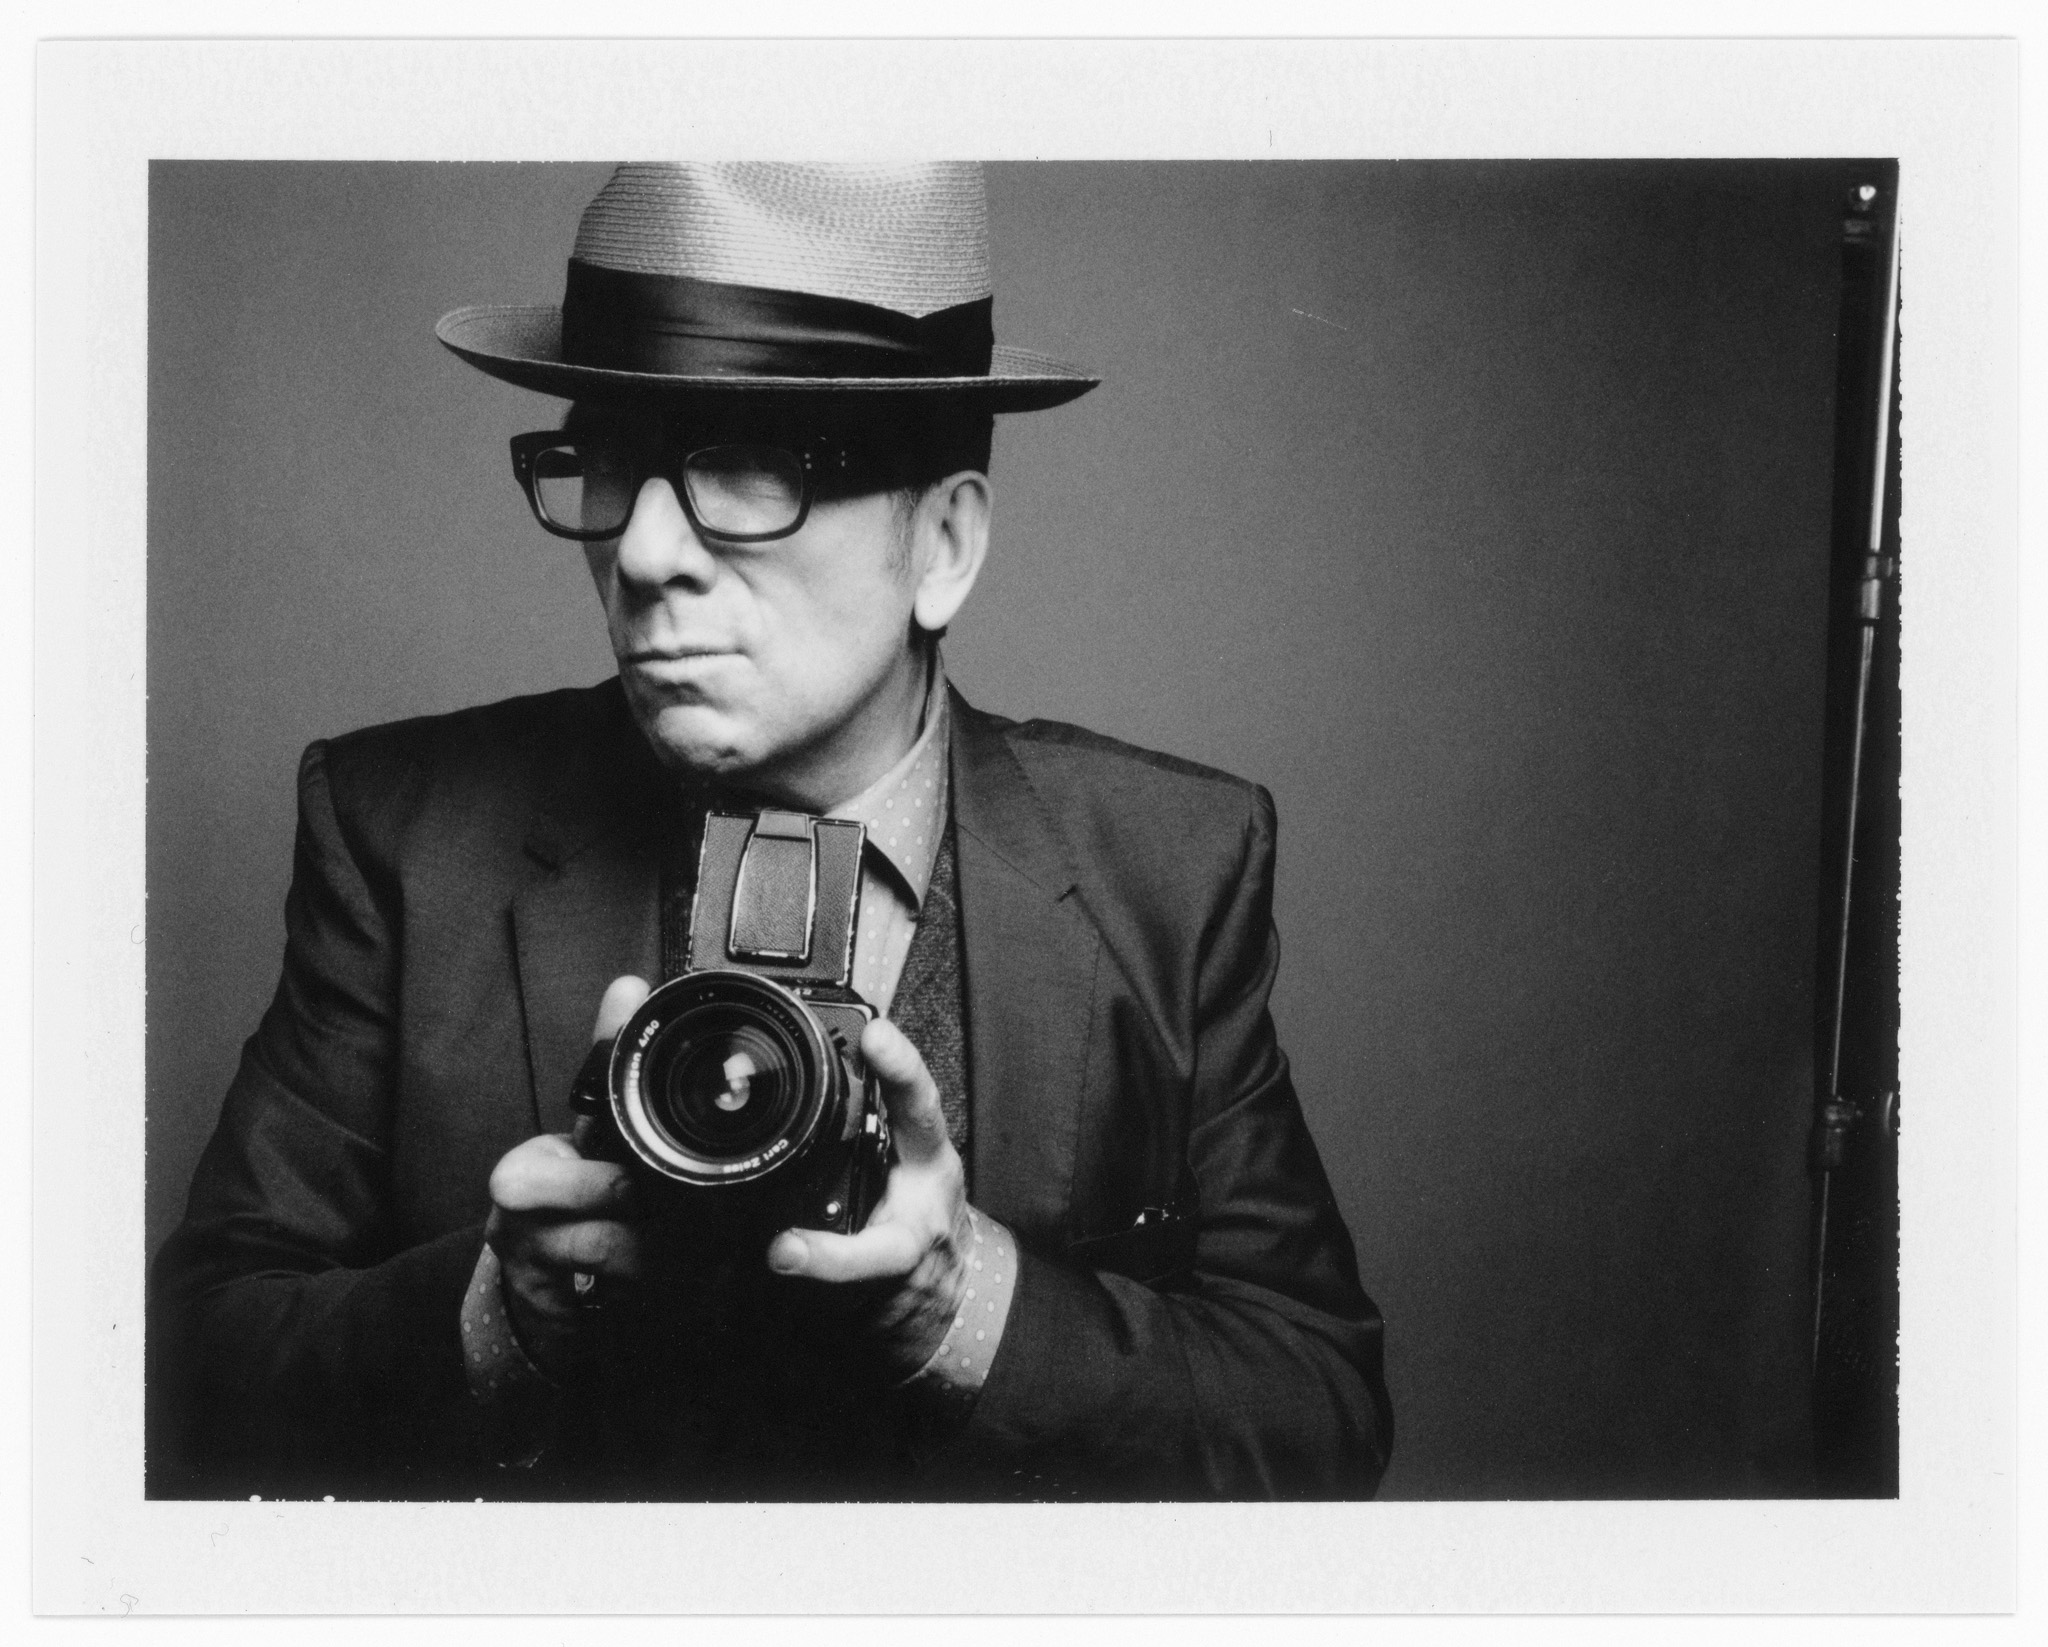 Elvis Costello_Questlove_Danny Clinch Photographer_Rebecca PIetri Stylist _Questlove_Portrait_3.jpg